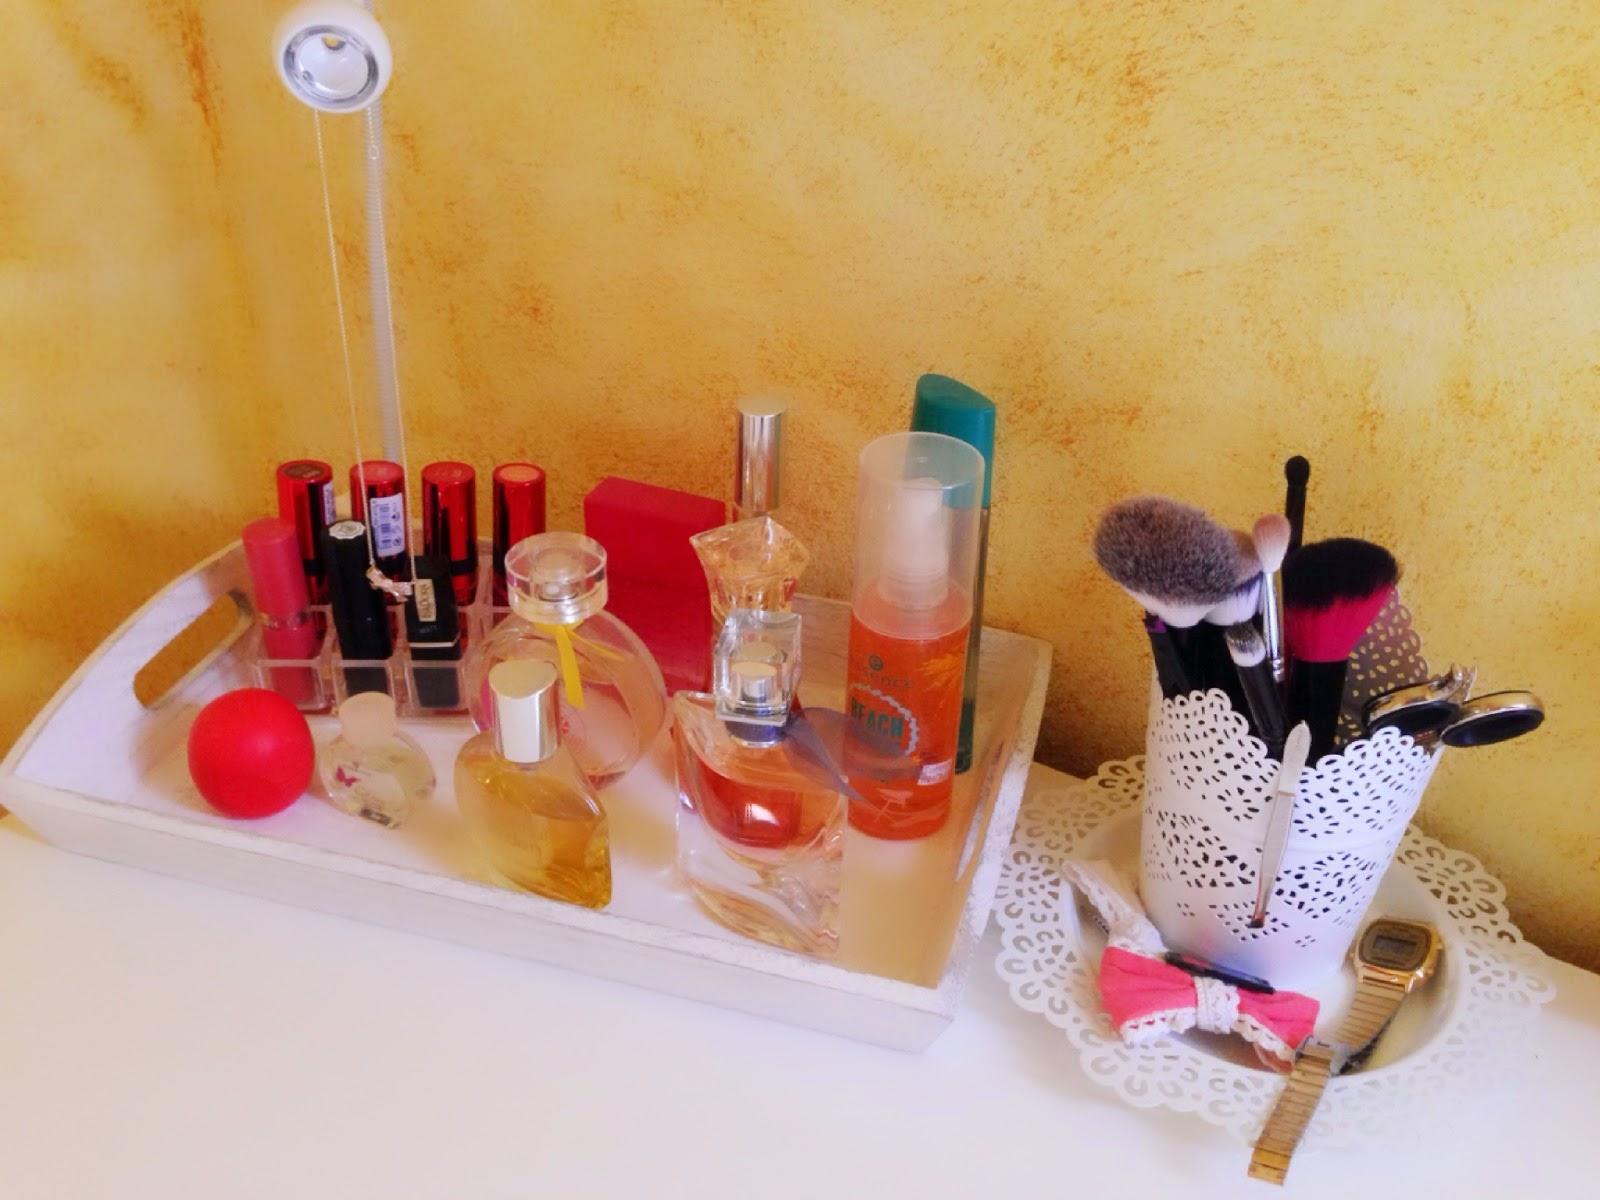 schminkbeh lter ikea schminke. Black Bedroom Furniture Sets. Home Design Ideas